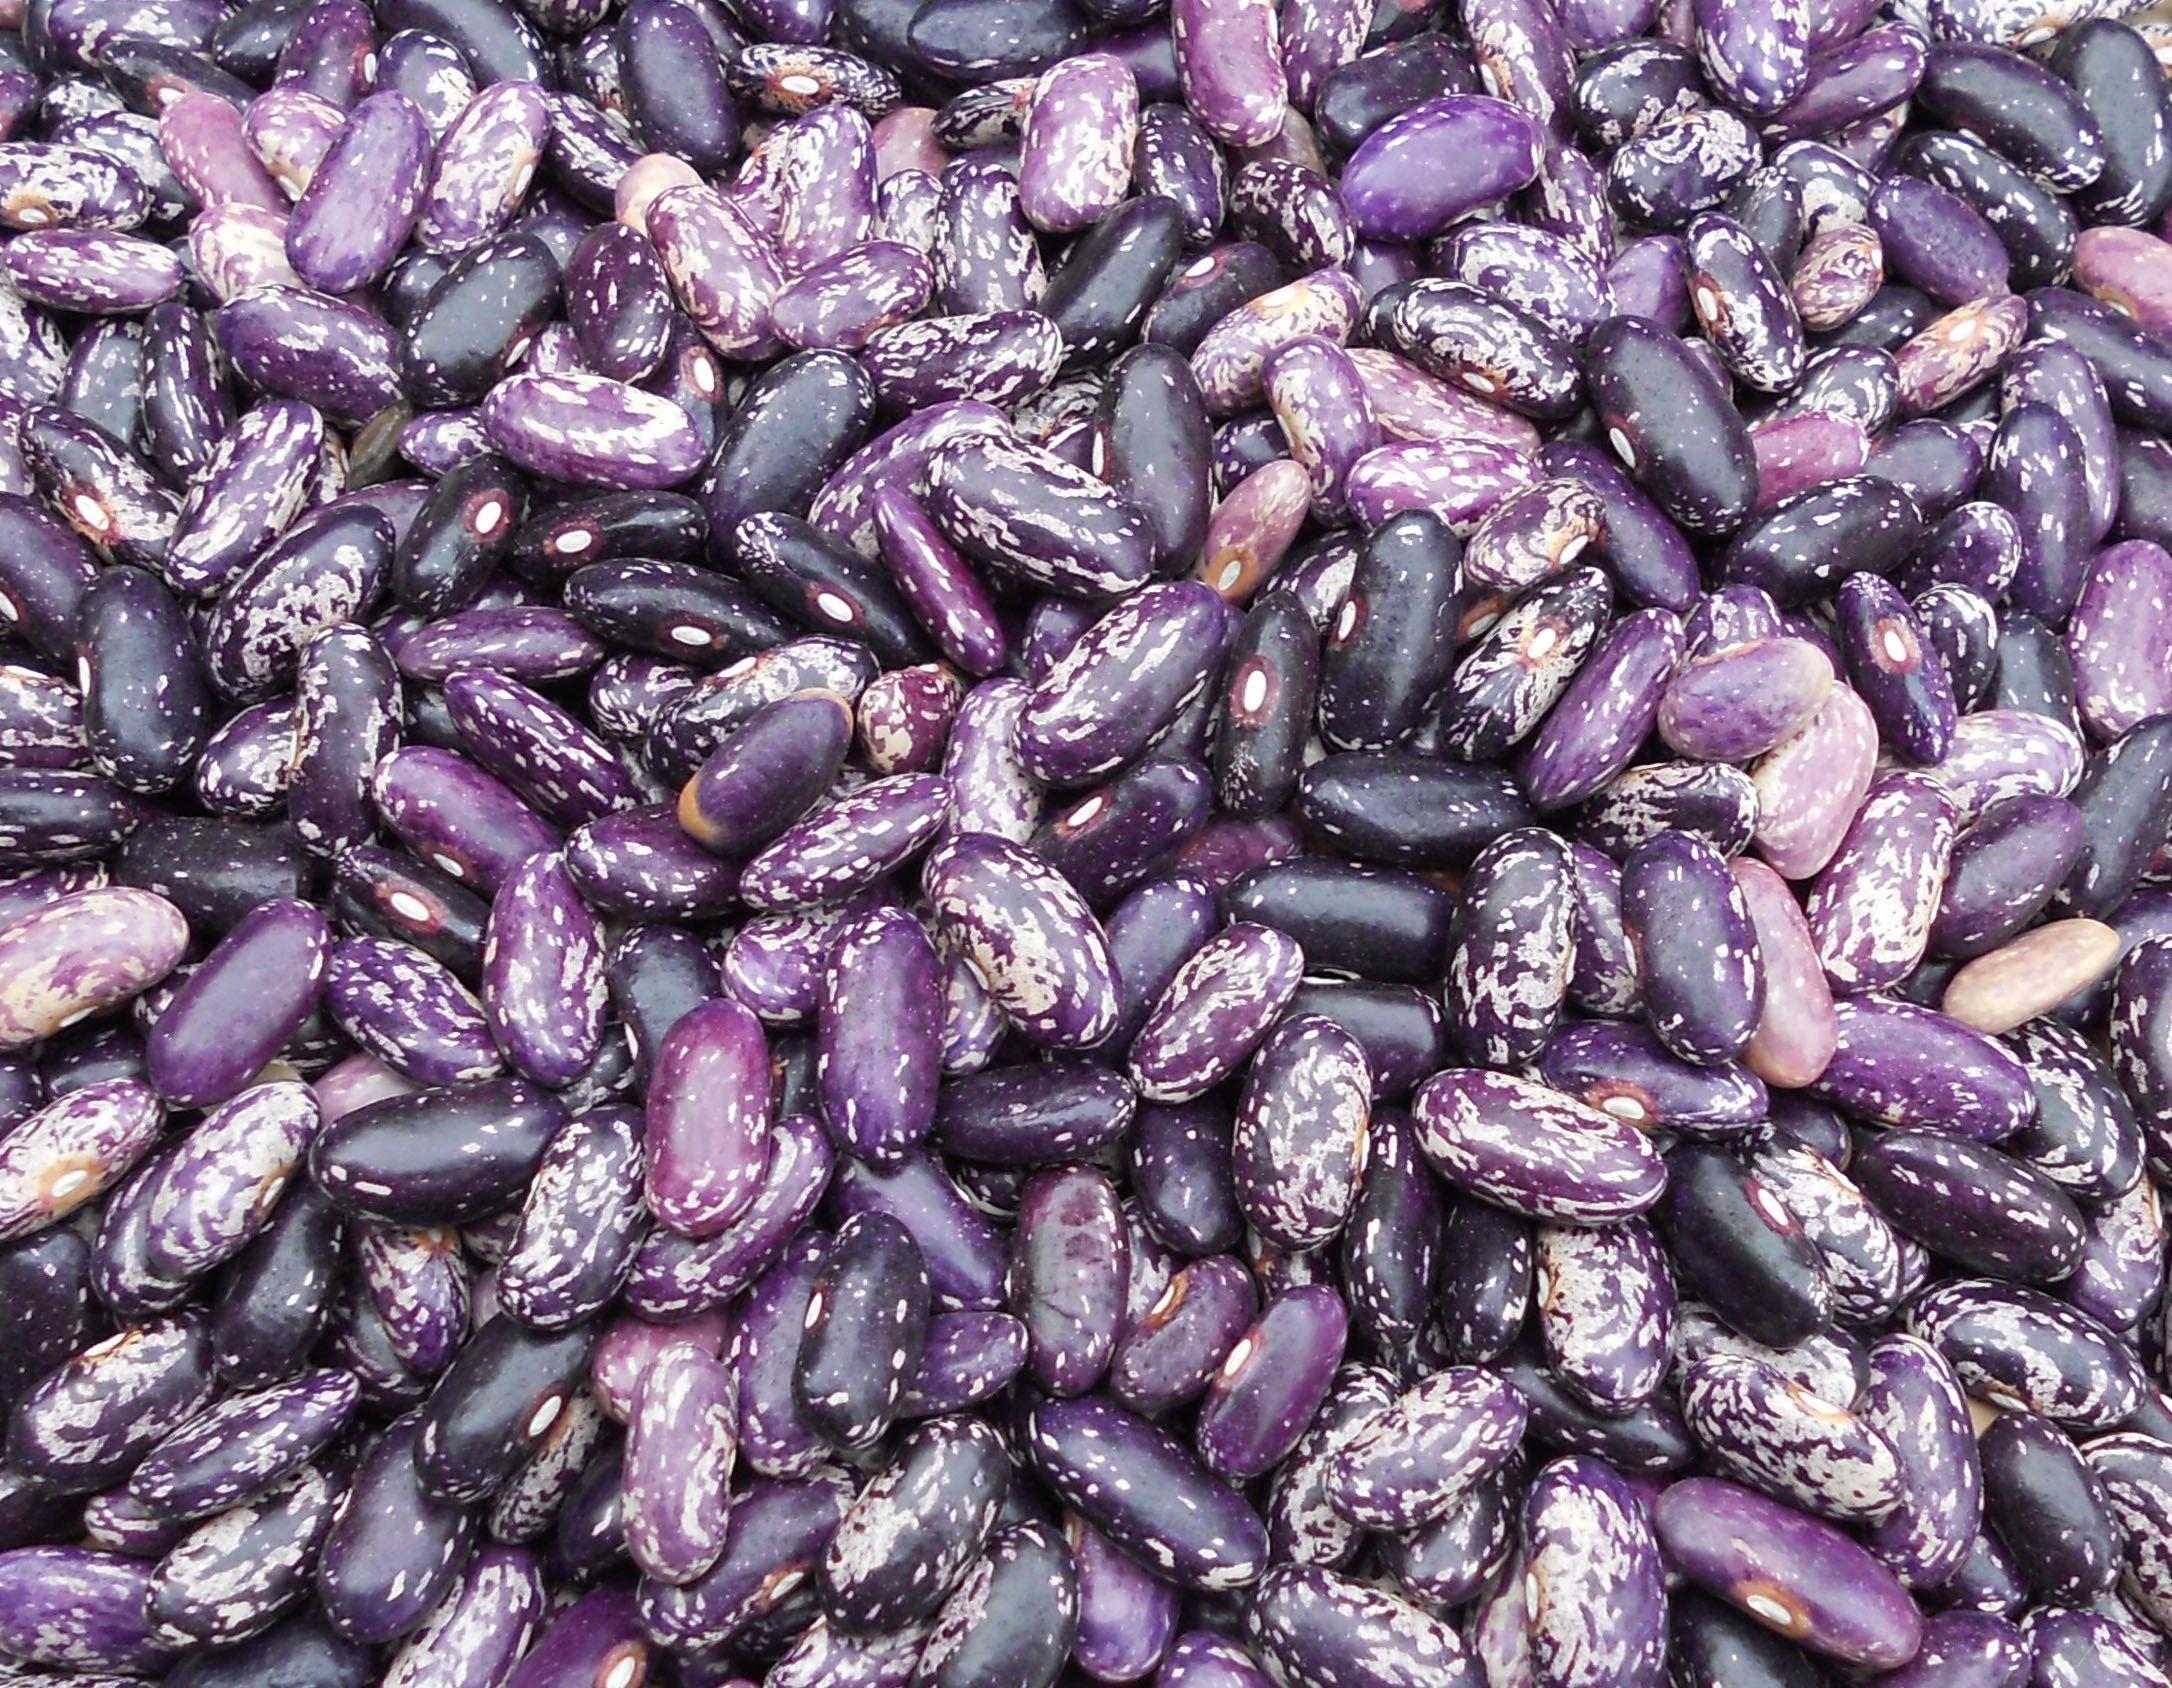 Dark purple striped fruit bush